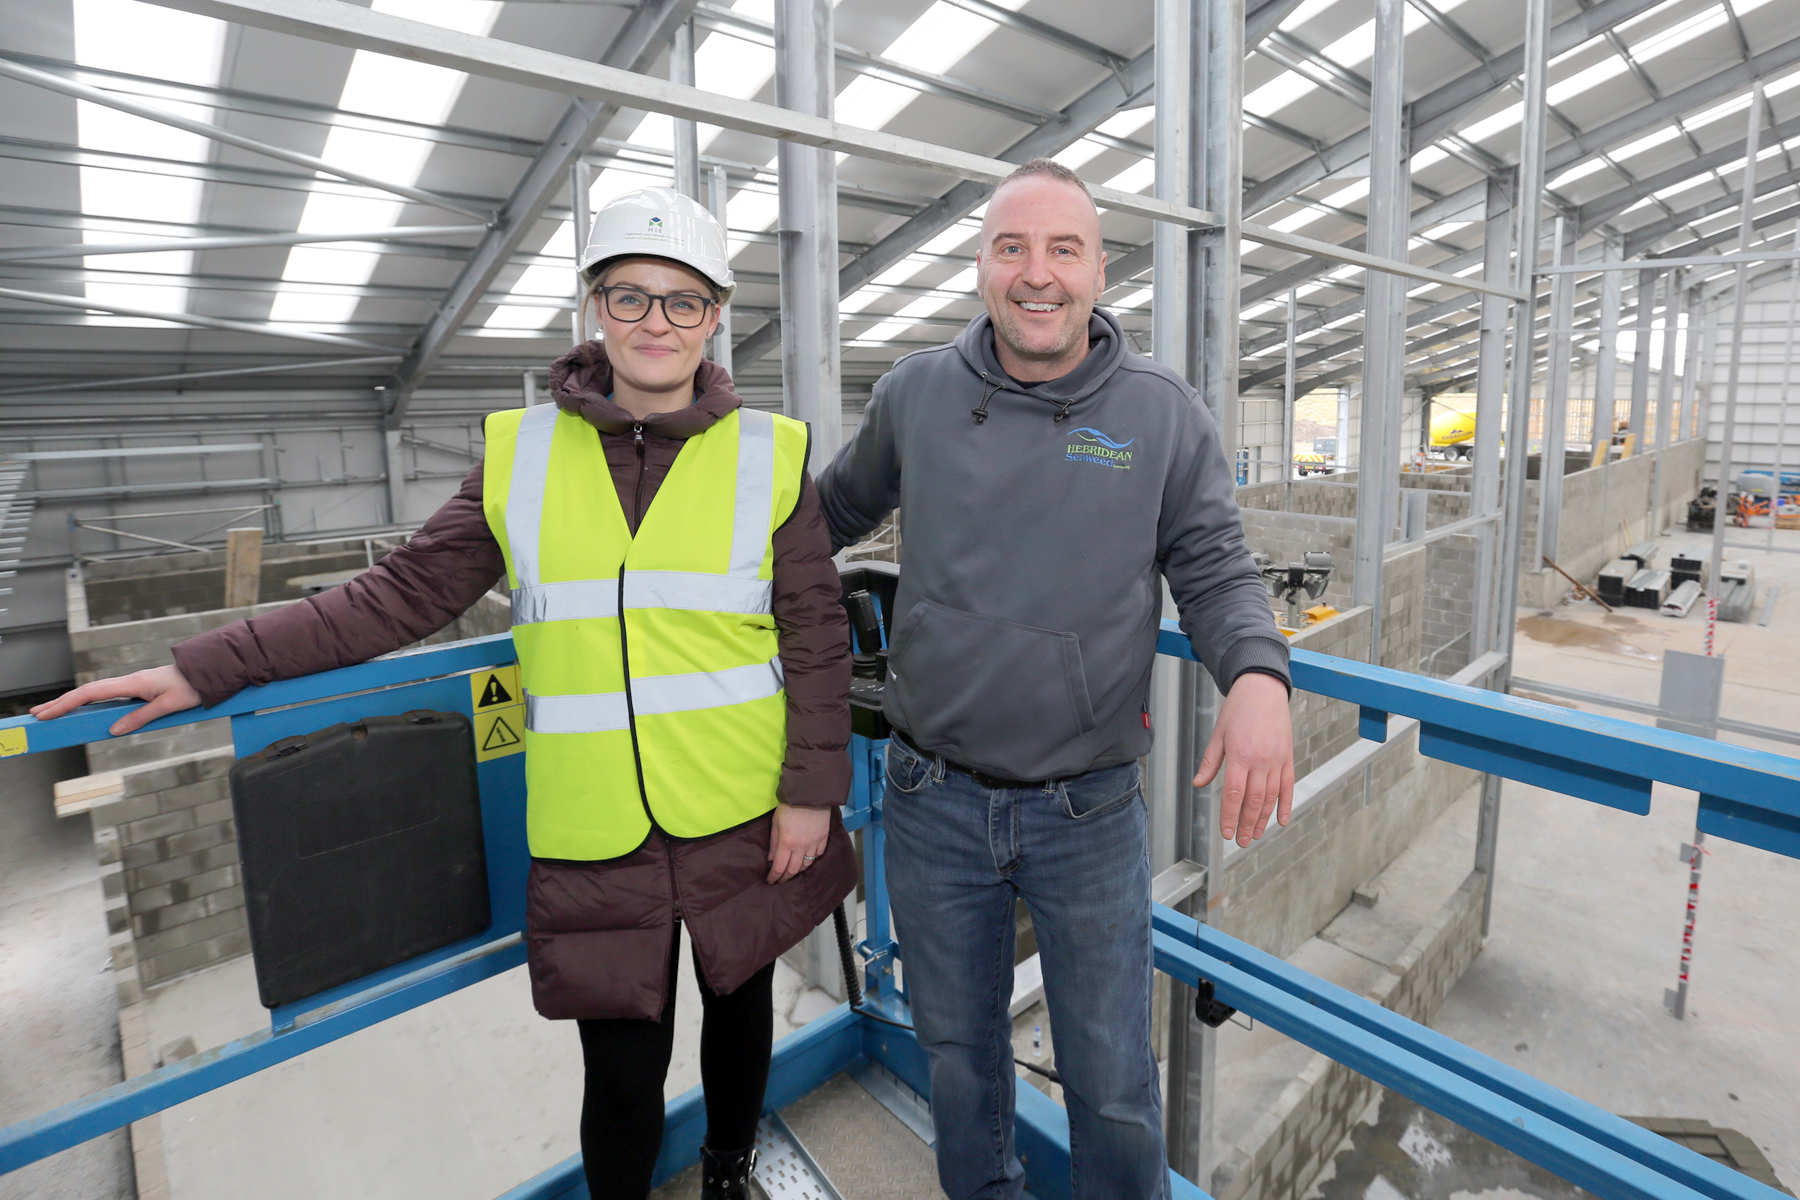 Joanna Peteranna, HIE, and Martin Macleod, managing director of Hebridean Seaweed.